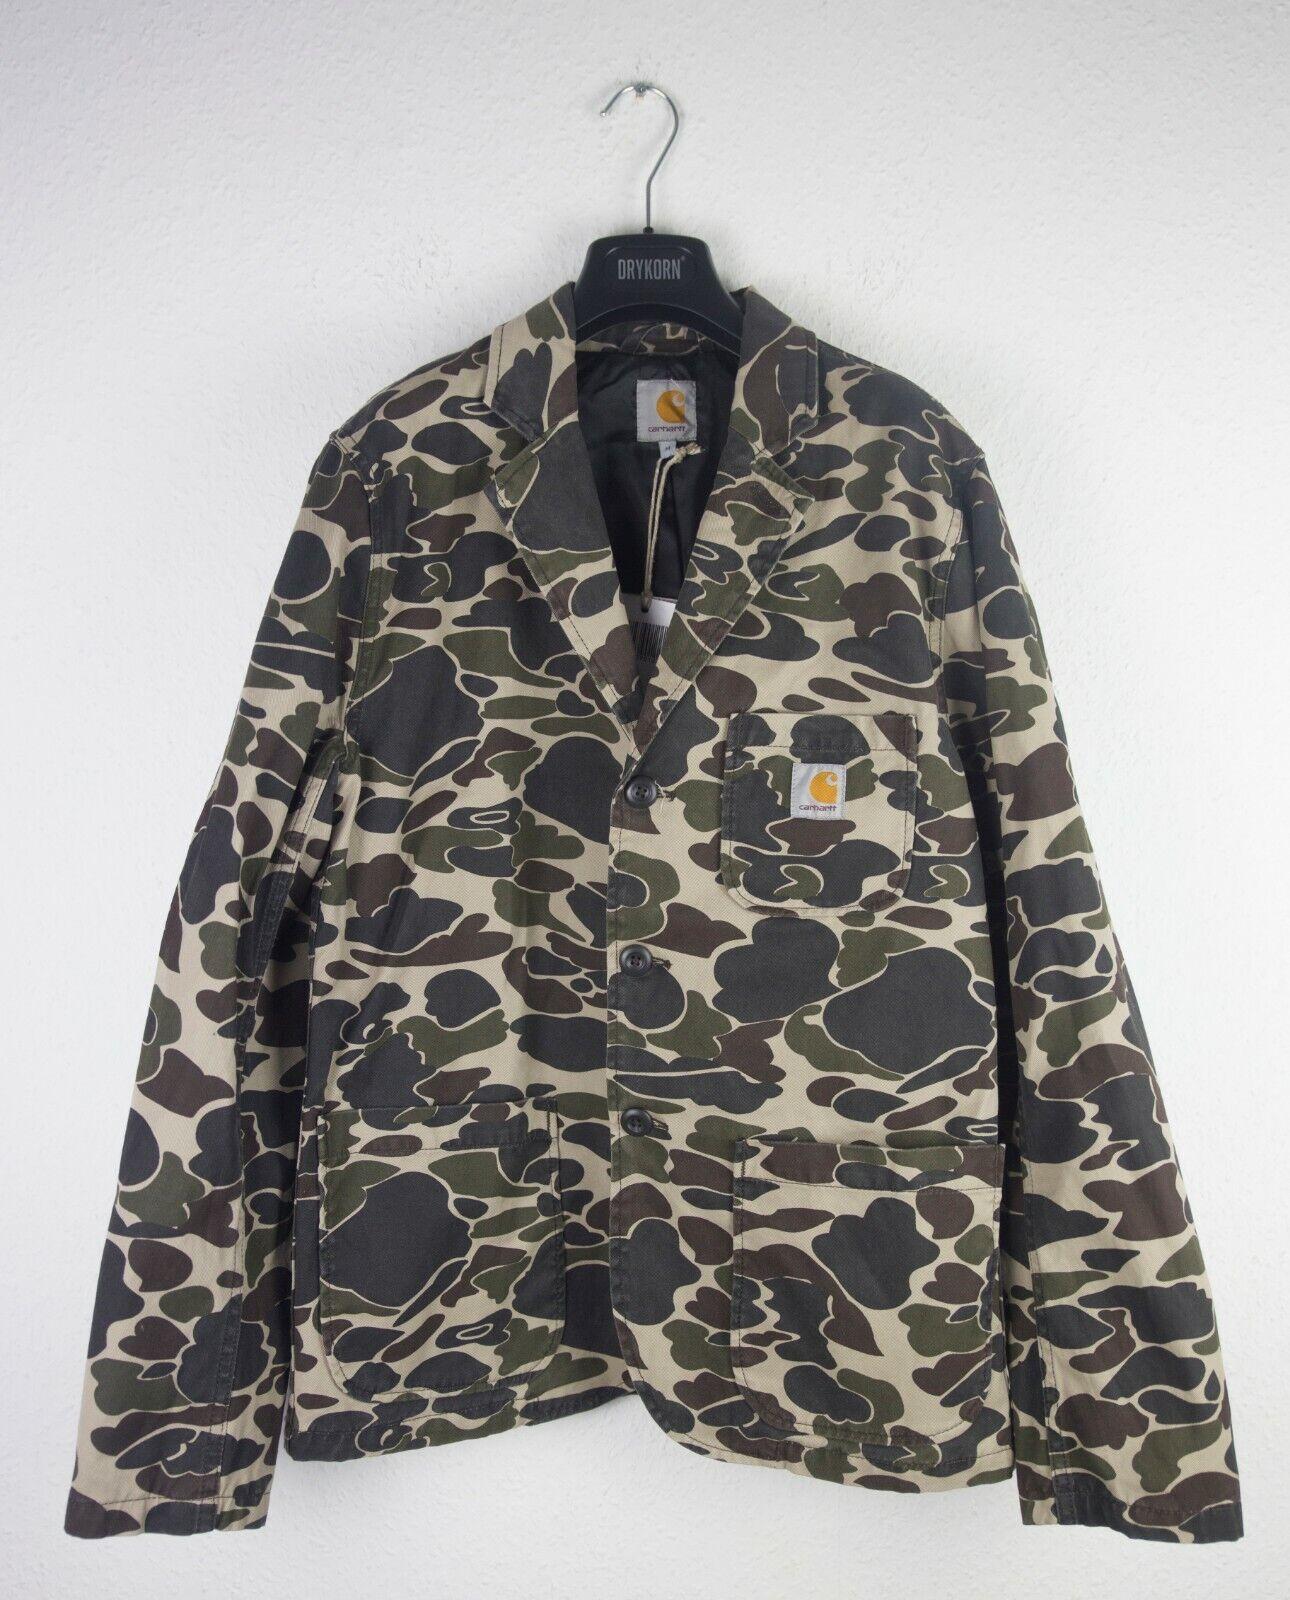 Carhartt WIP Sid Blazer Sakko Camo Isle Rigid Camouflage Armee green Größe M